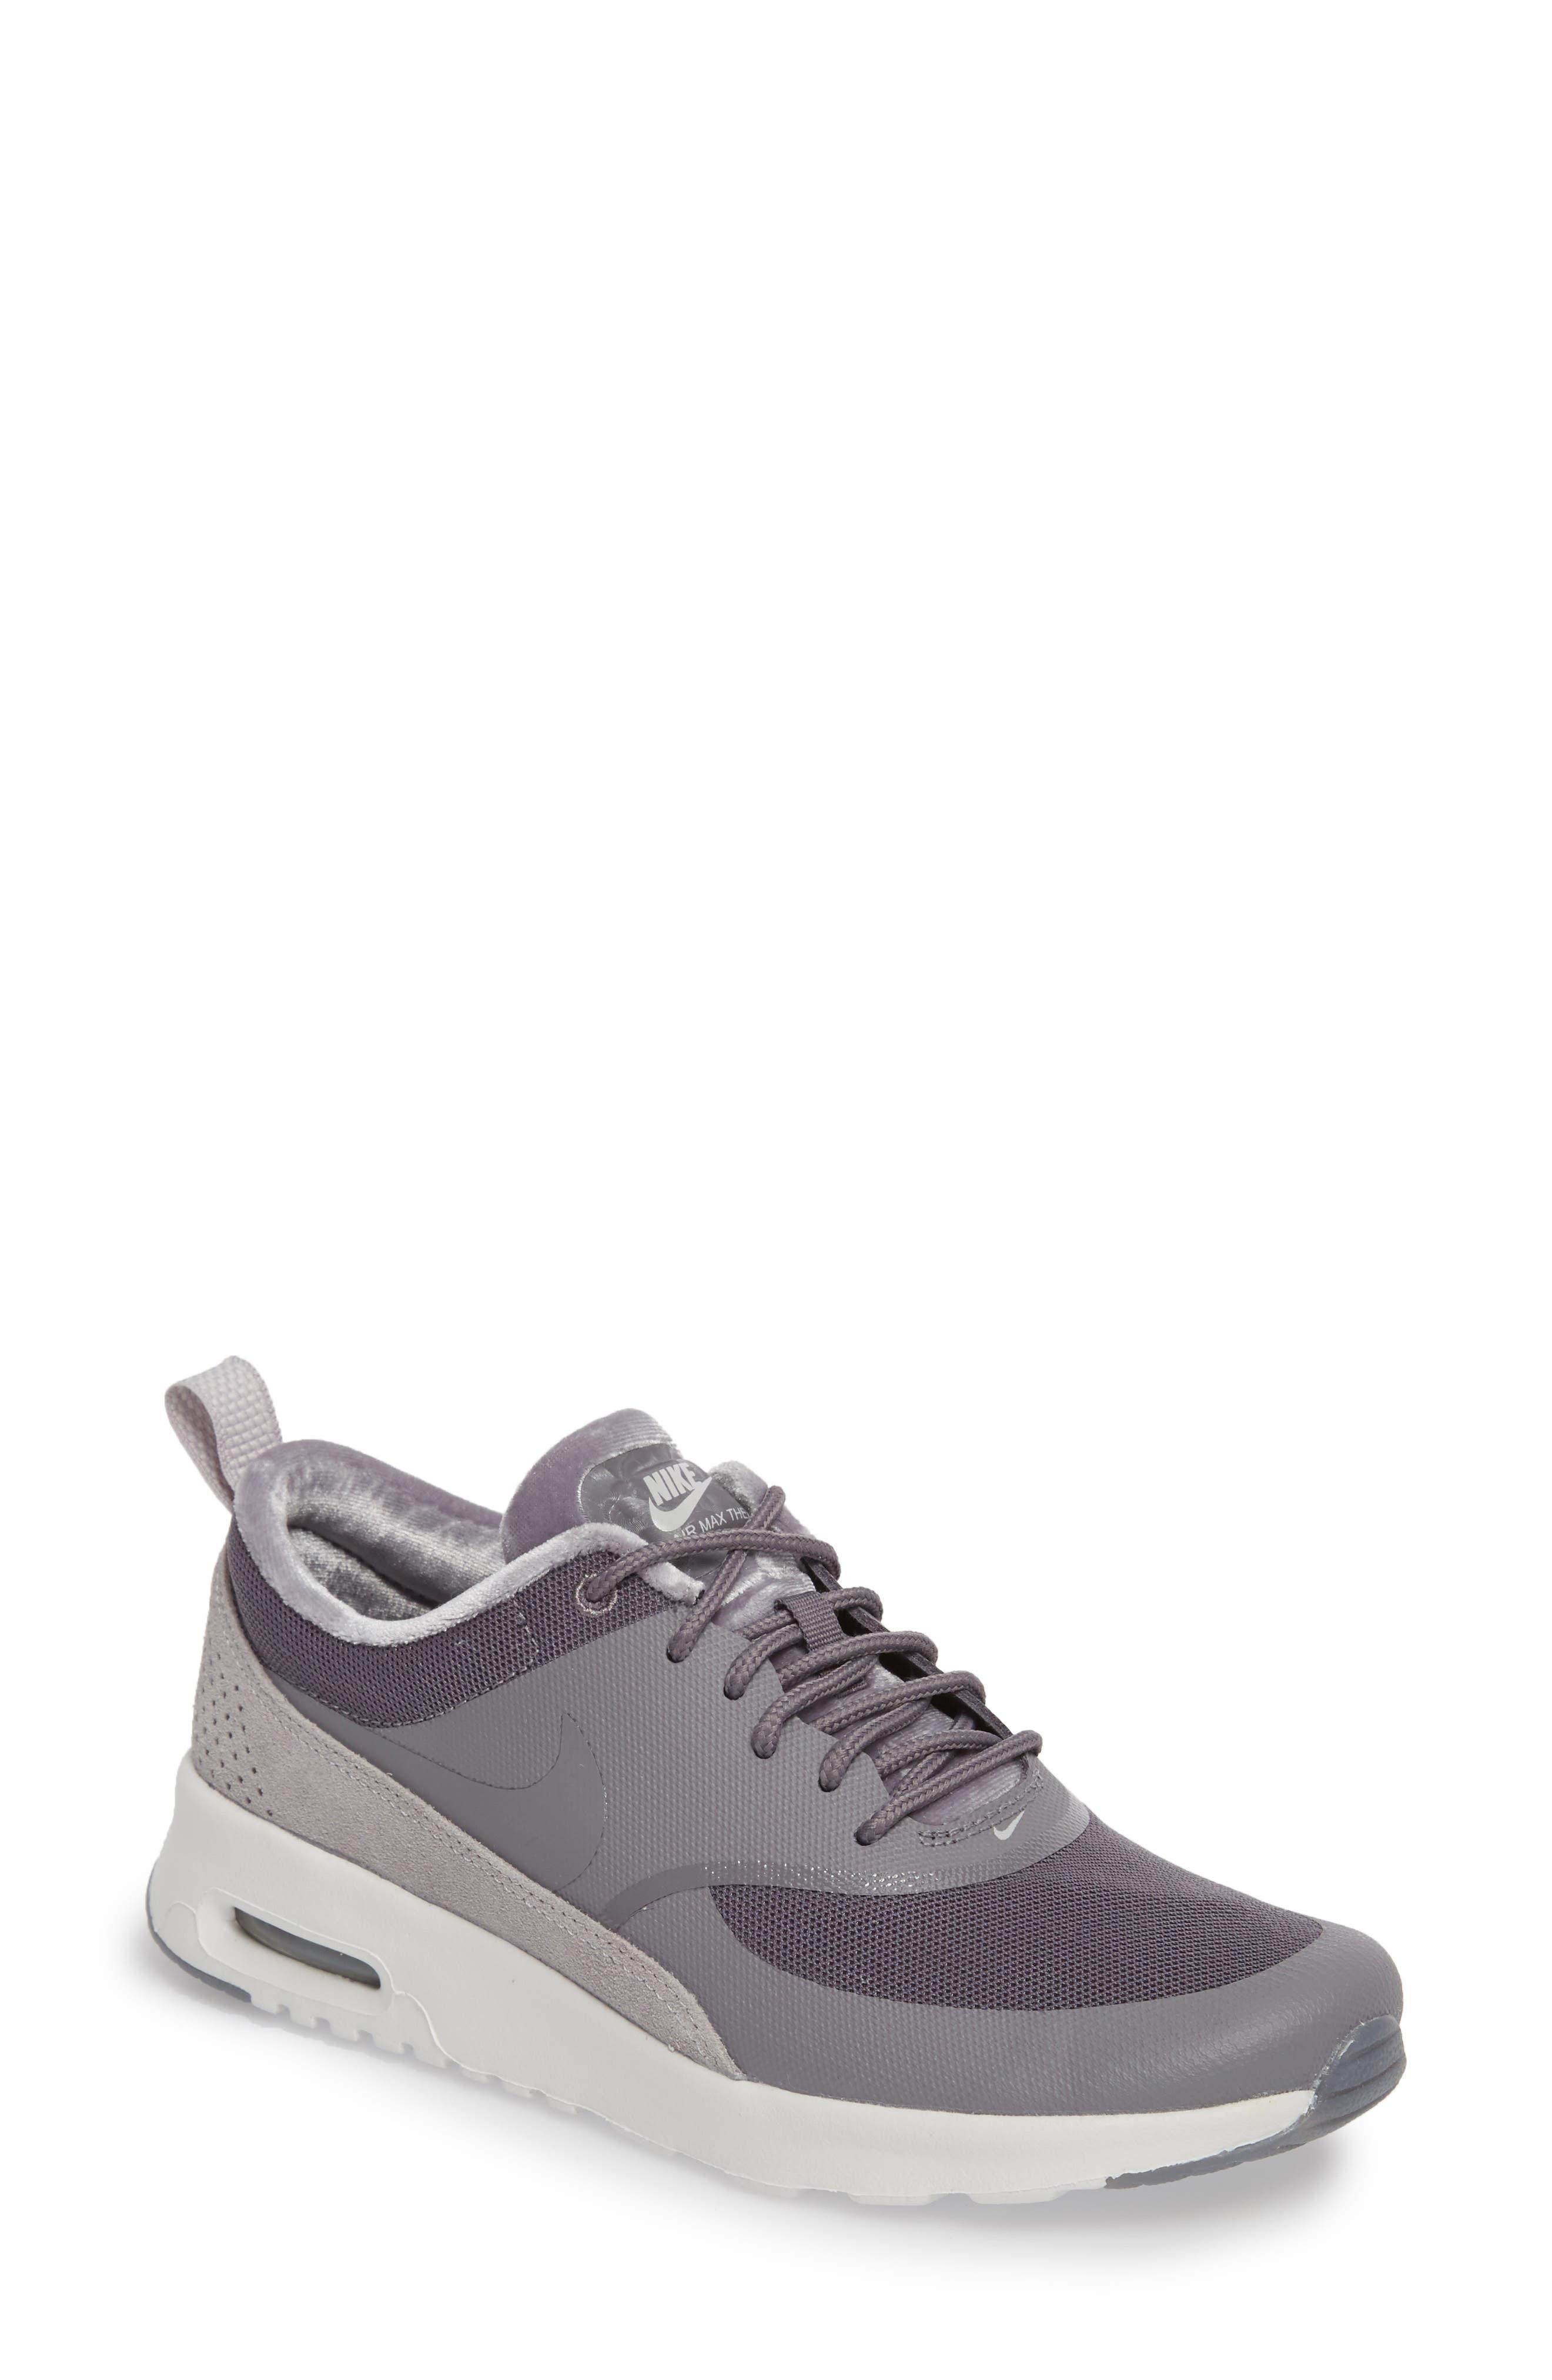 Air Max Thea LX Sneaker,                         Main,                         color, 022